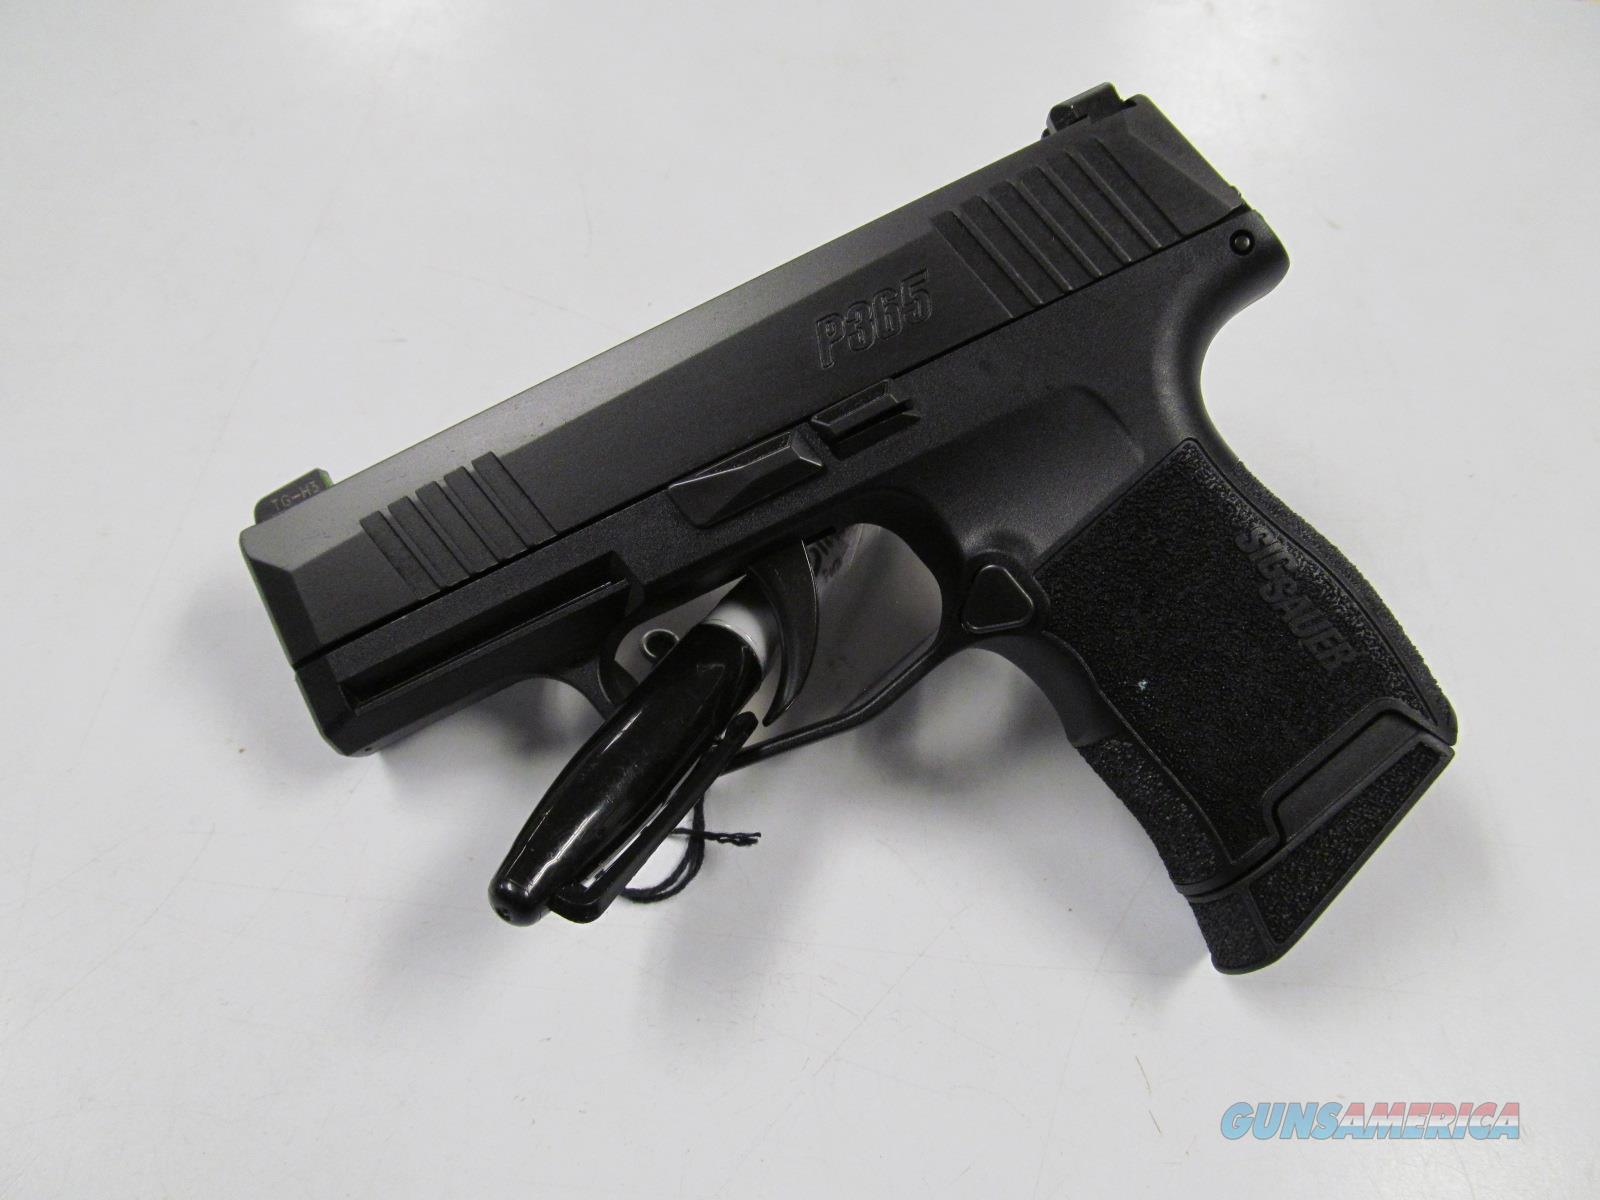 Sig Sauer P365 (365-9-BXR3)  Guns > Pistols > Sig - Sauer/Sigarms Pistols > P365